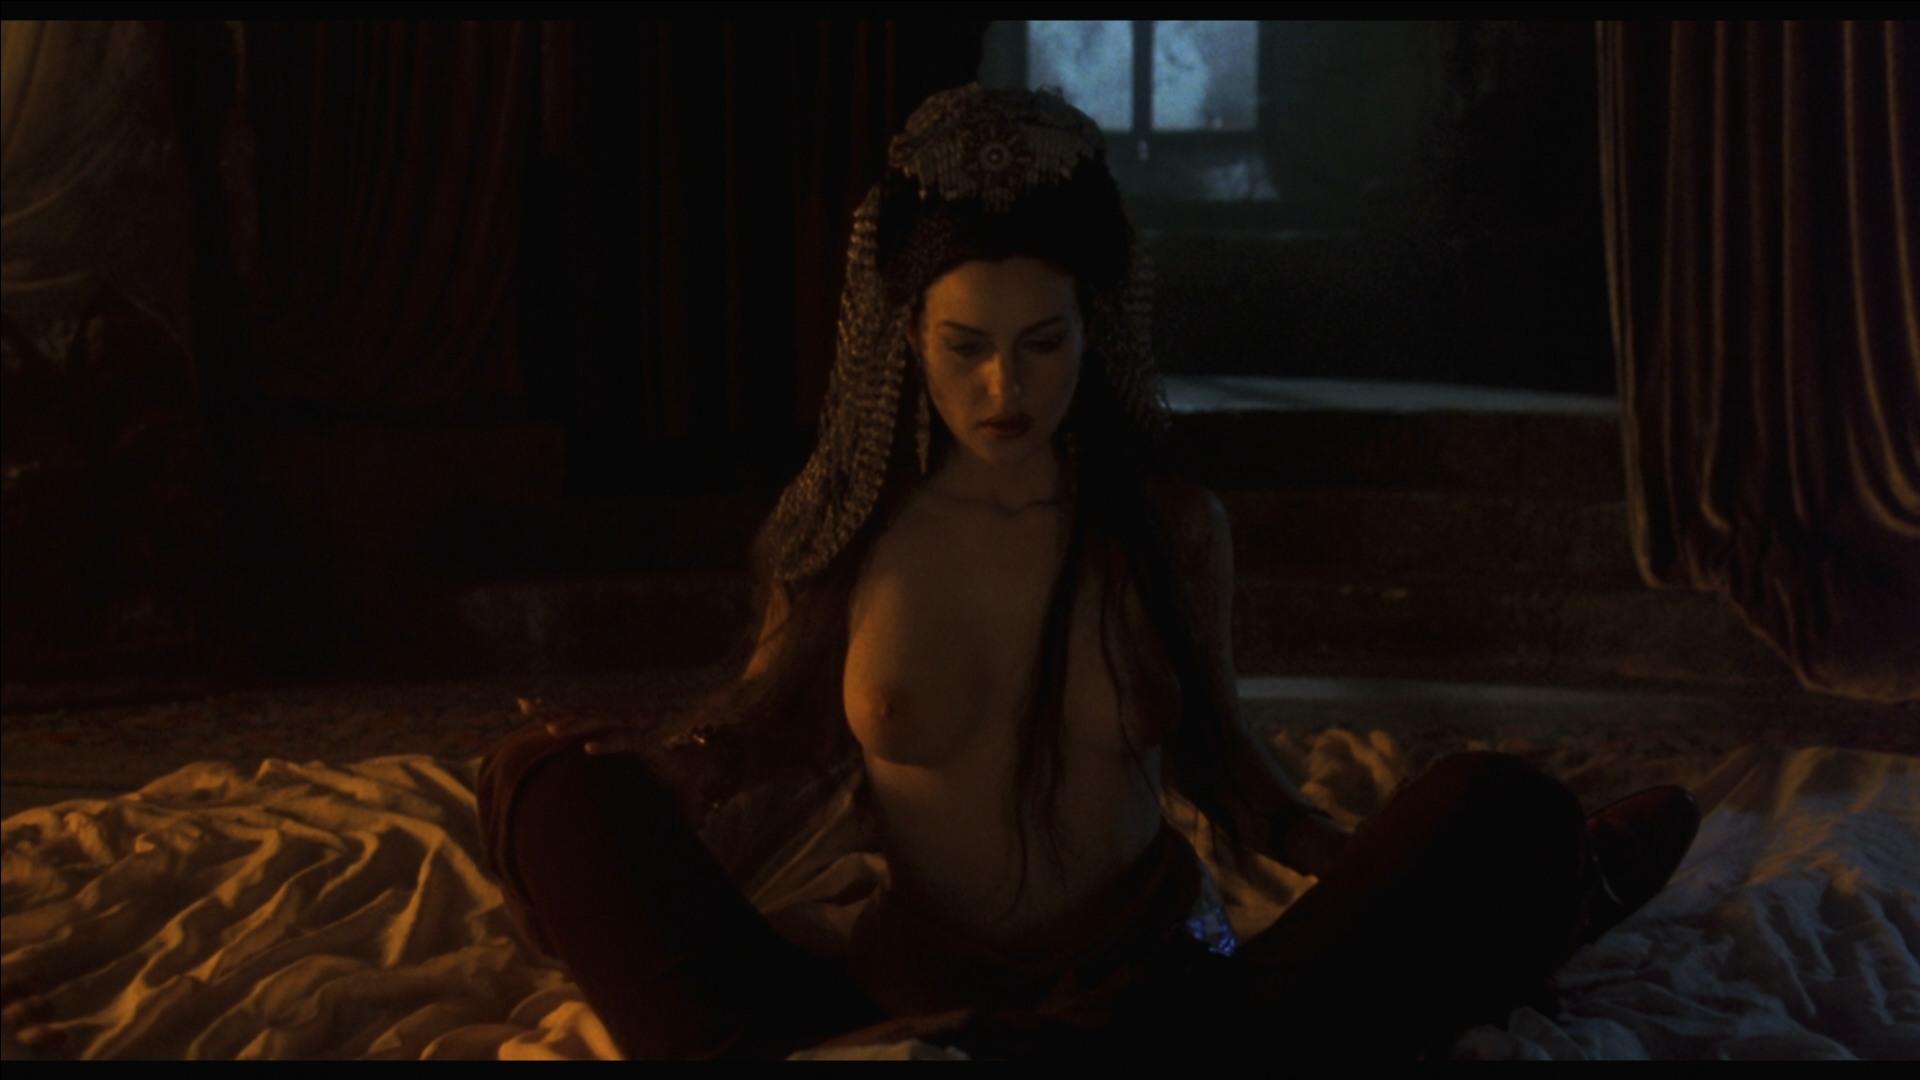 seksualnye kadry kino 14